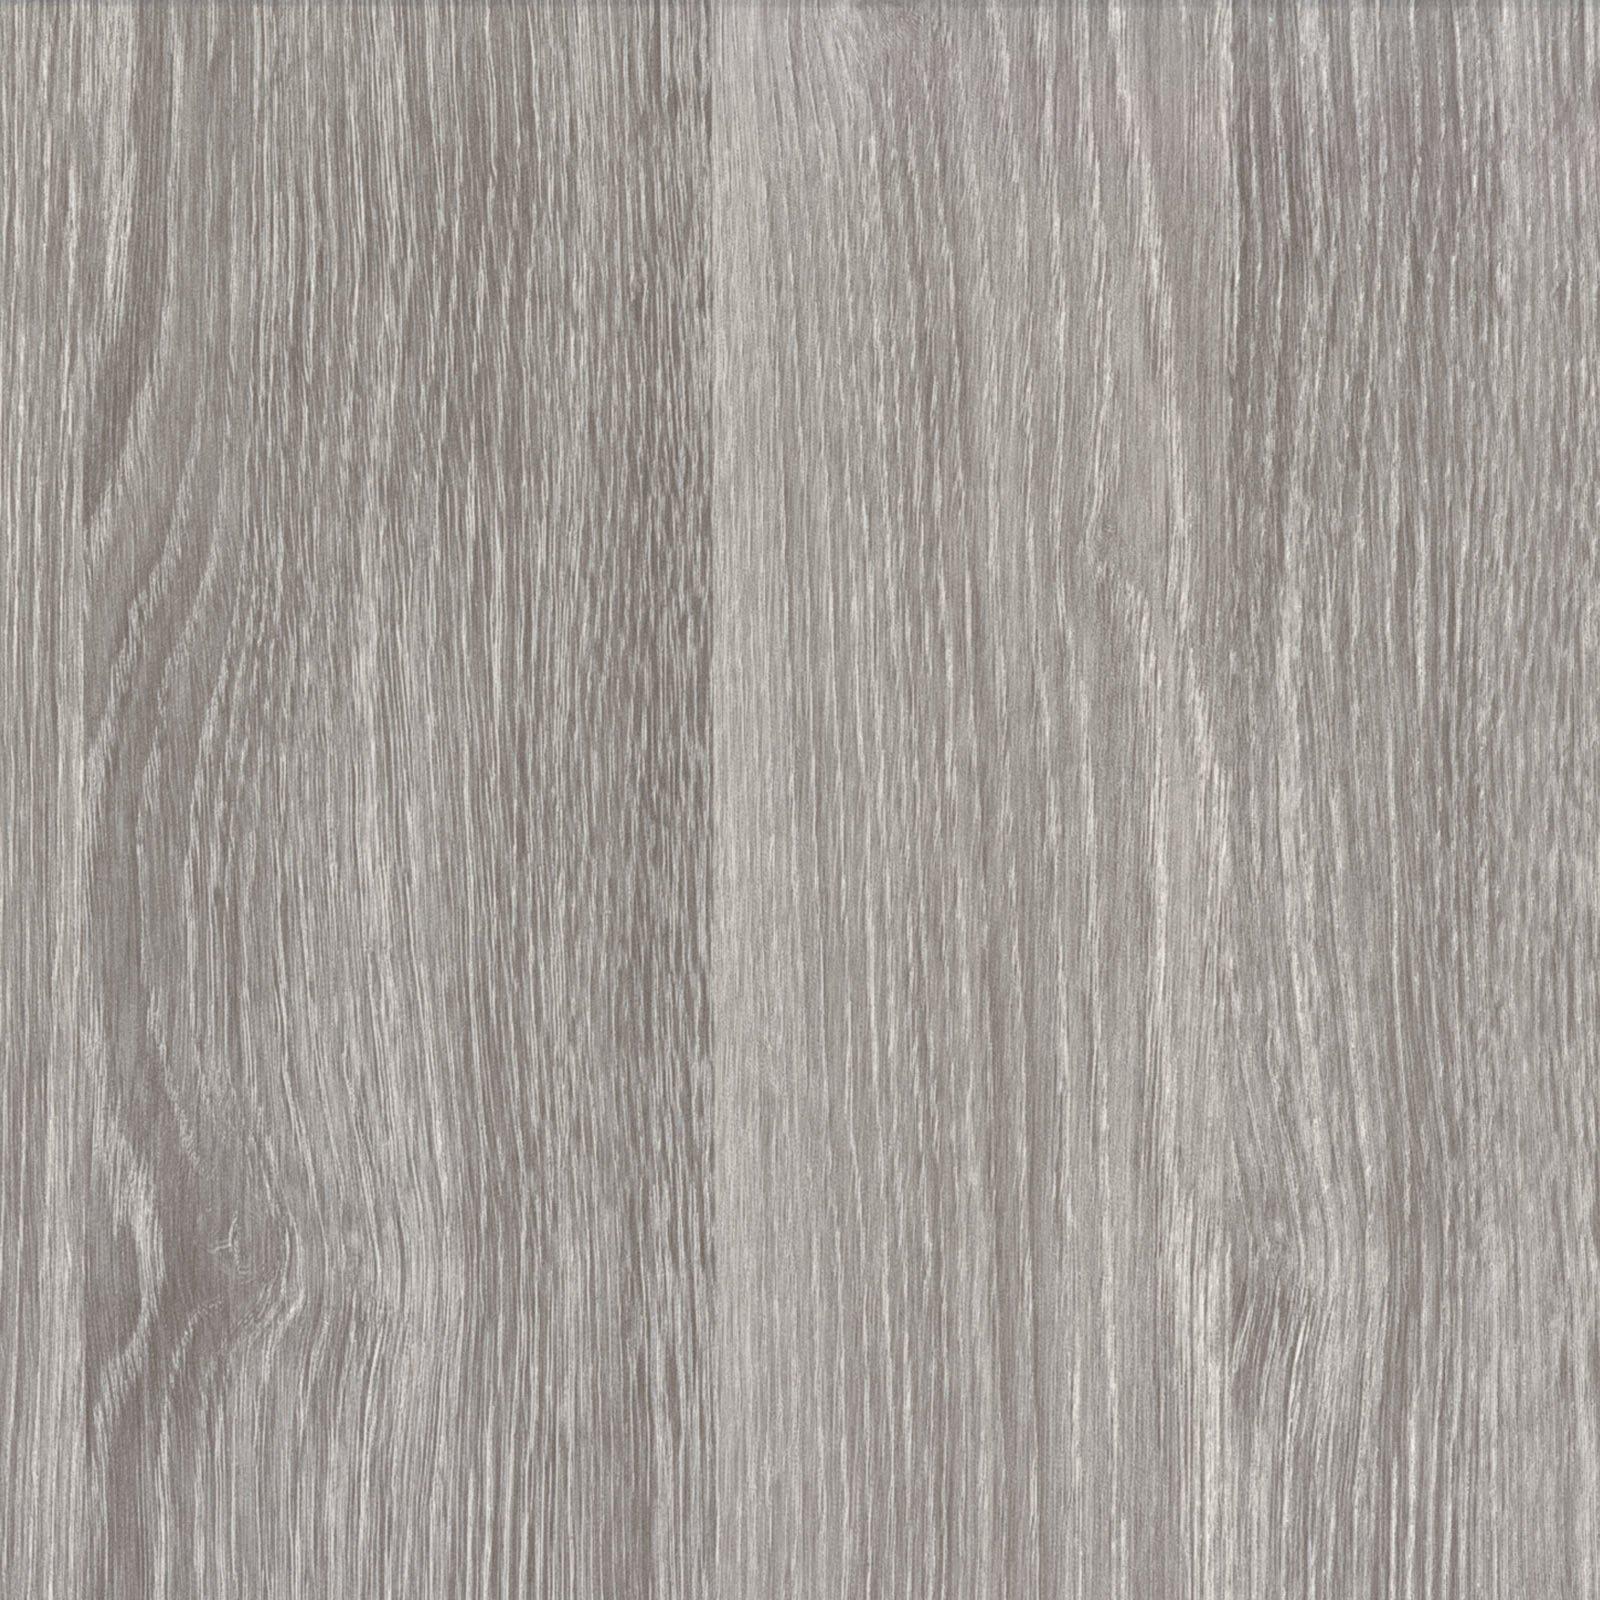 D c klebefolie sheffield grau 90x210 cm dekor for Klebefolie dekor